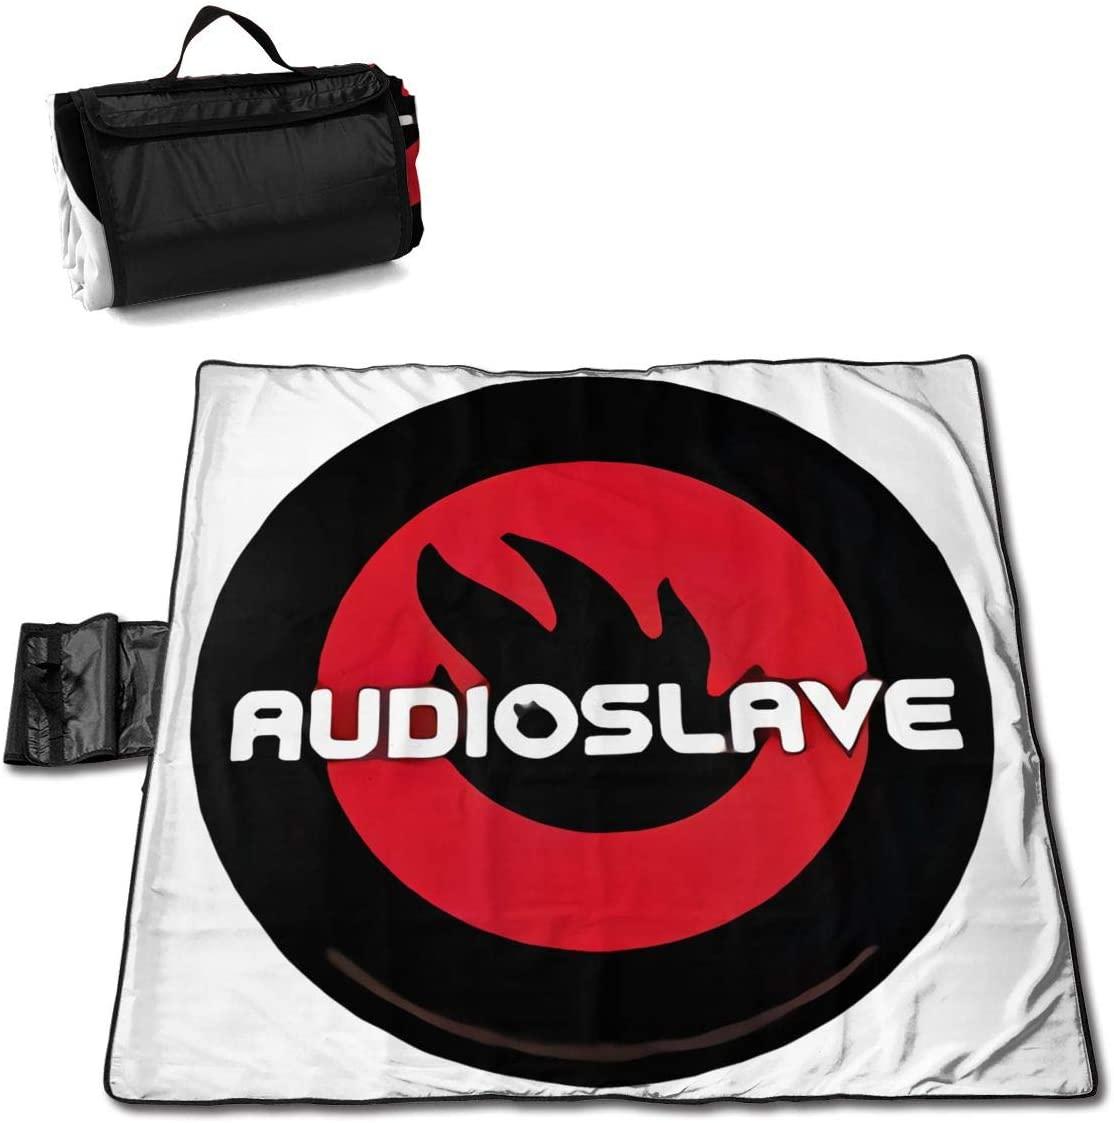 Htw Au-Dioslave Portable Printed Picnic Blanket Waterproof 59x57(in)